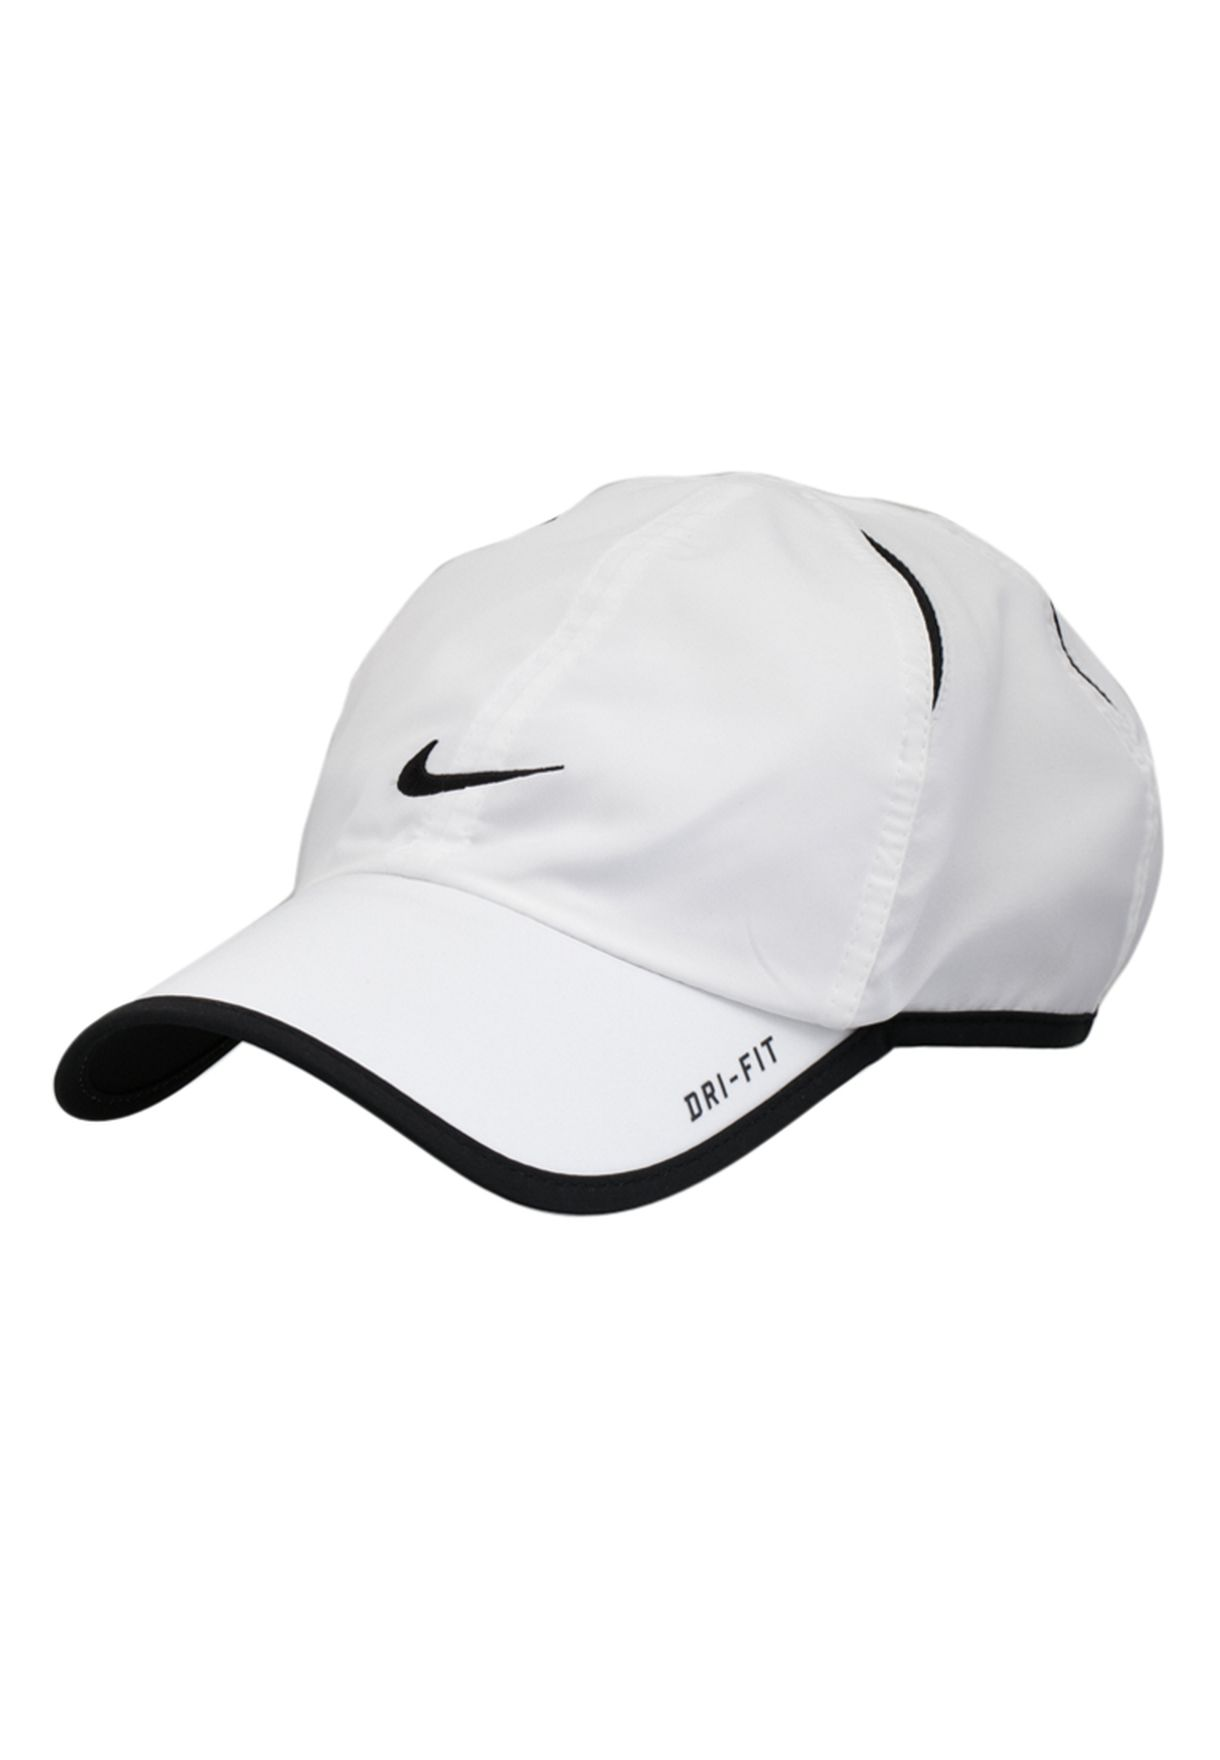 3a6883db88e Shop Nike white Feather Light Cap NKAP595510-100 for Men in Qatar -  NI727AC71TBG